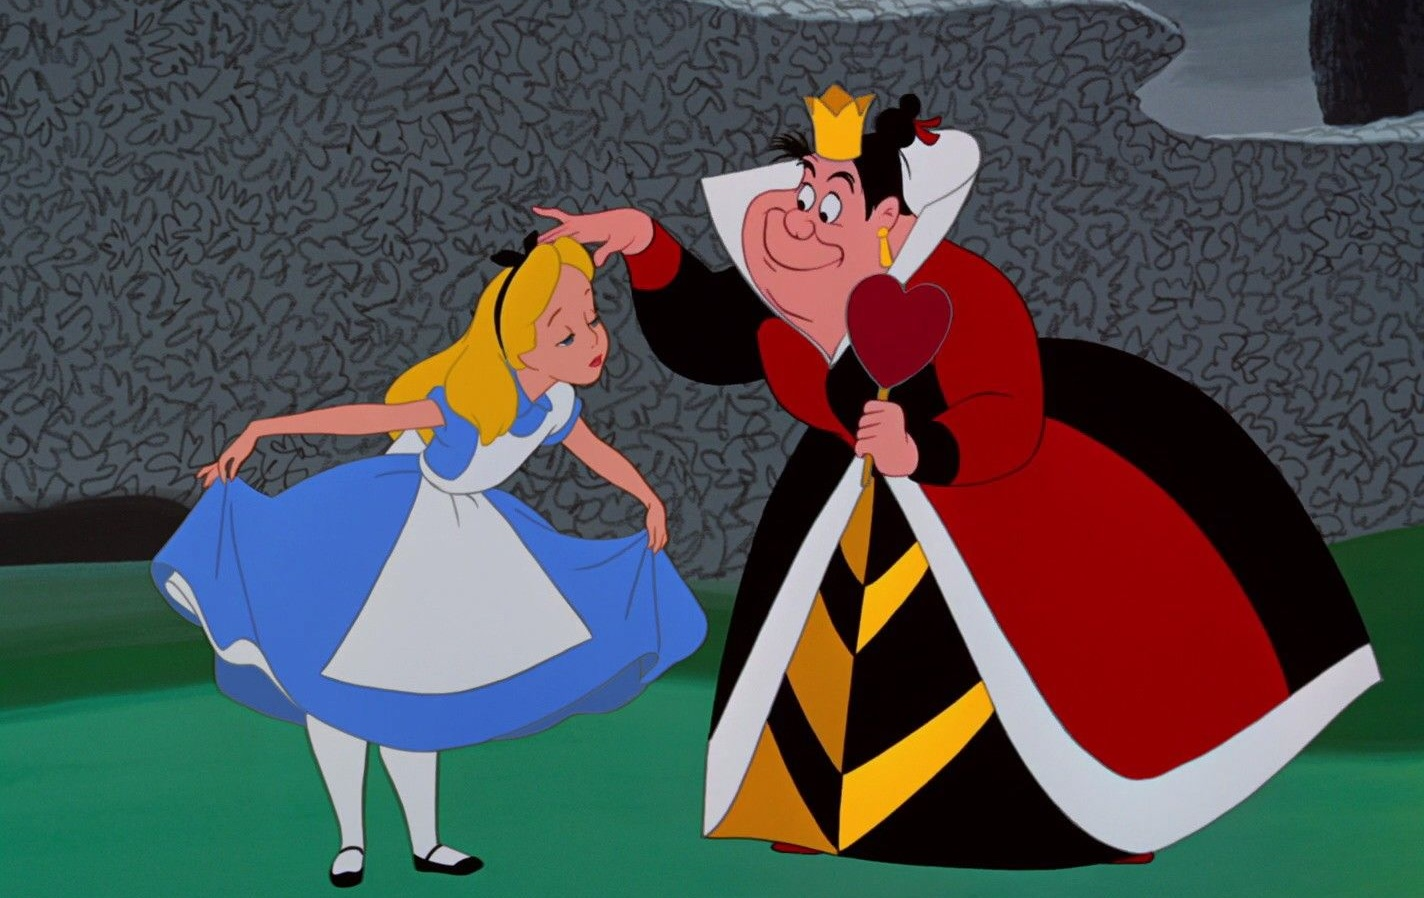 21. Alice in Wonderland